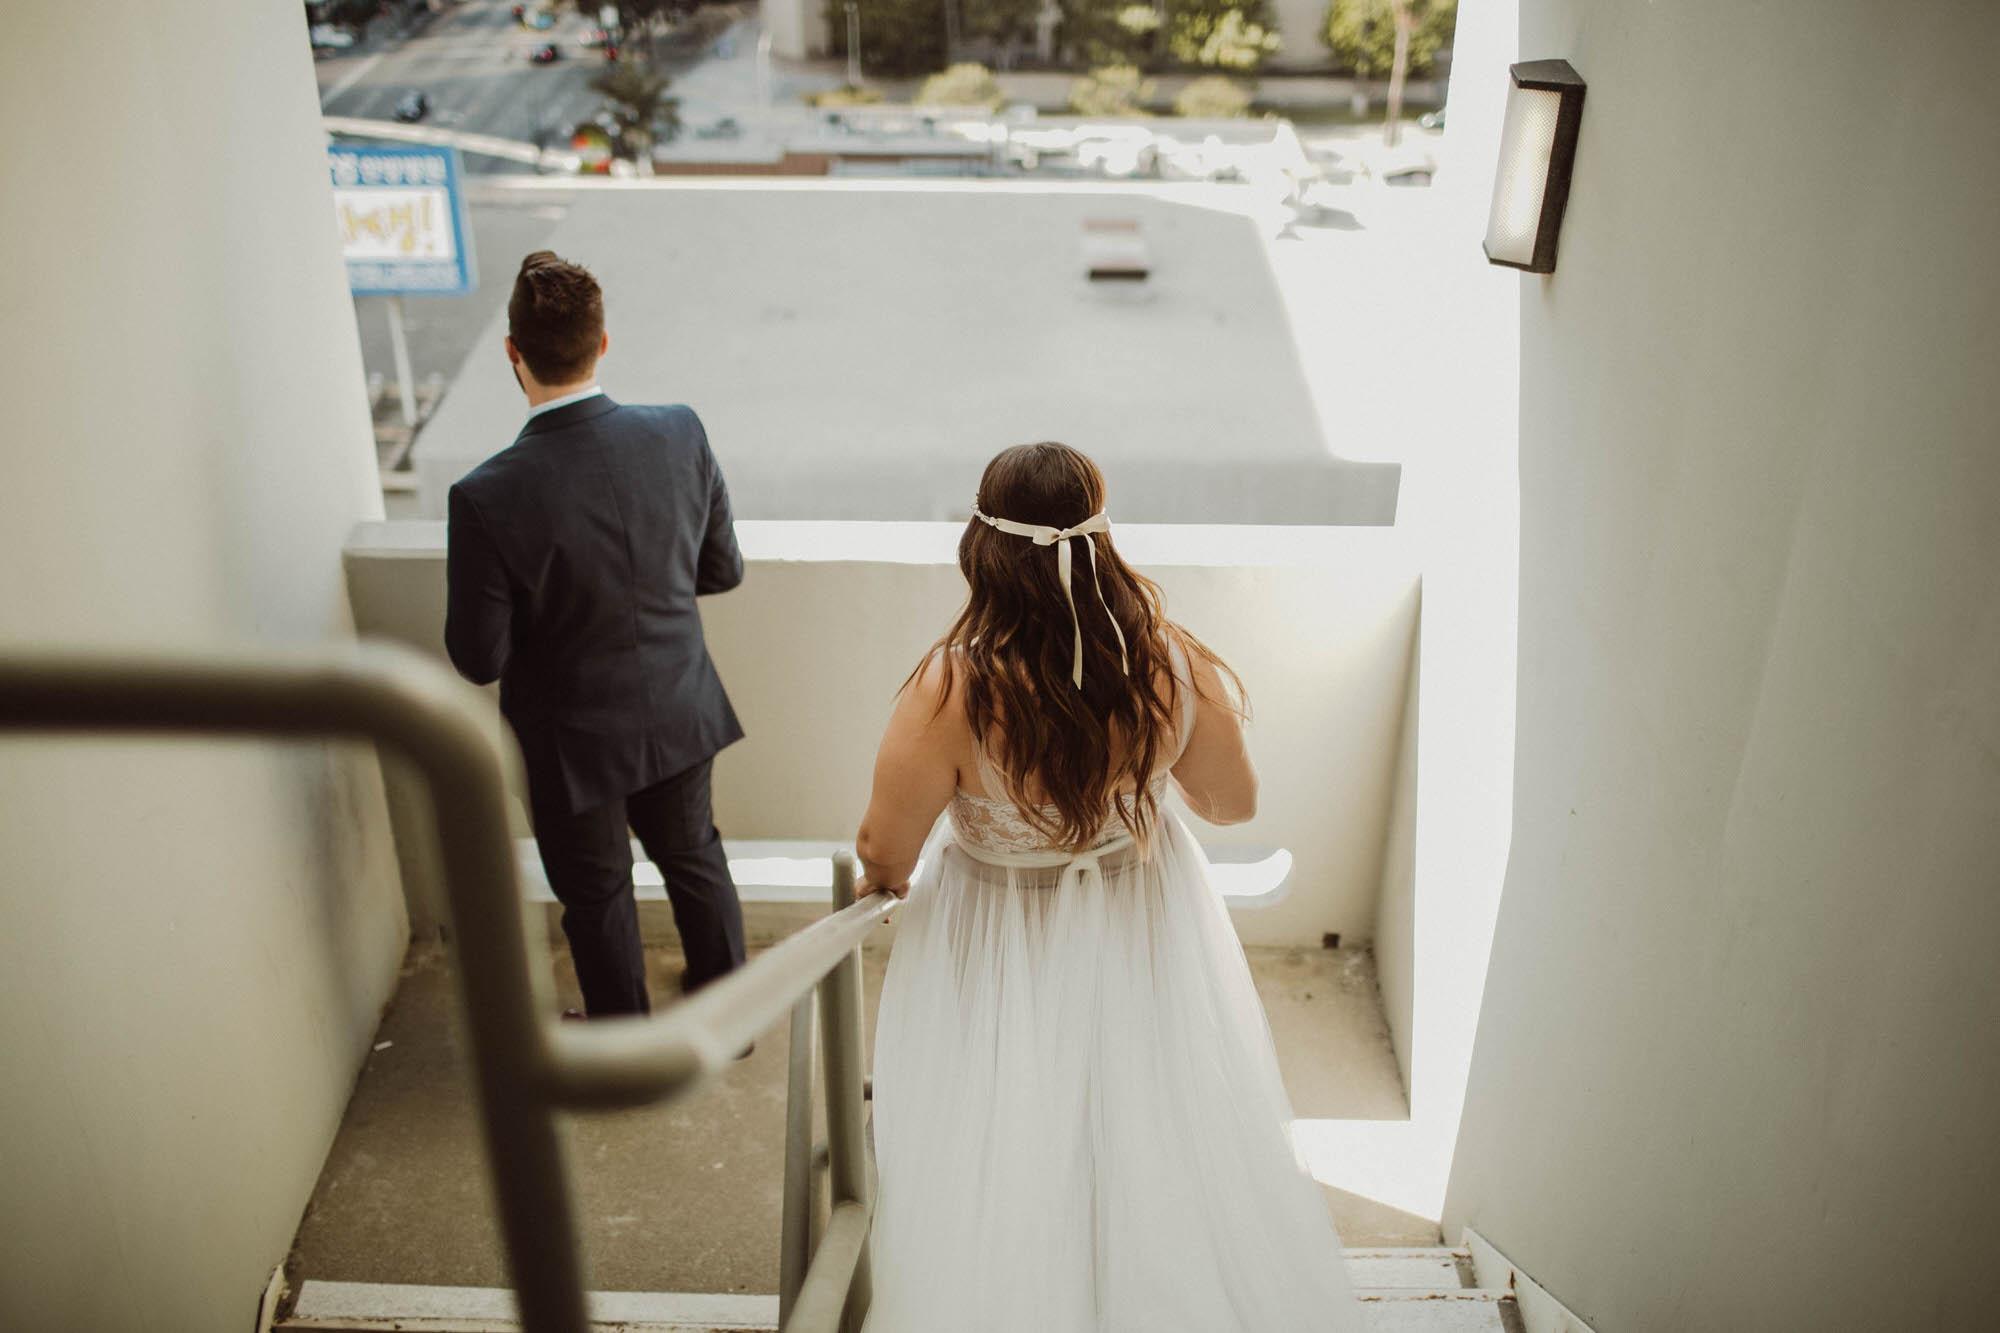 los-angeles-wedding-photographer-kristen-dylan-31.jpg